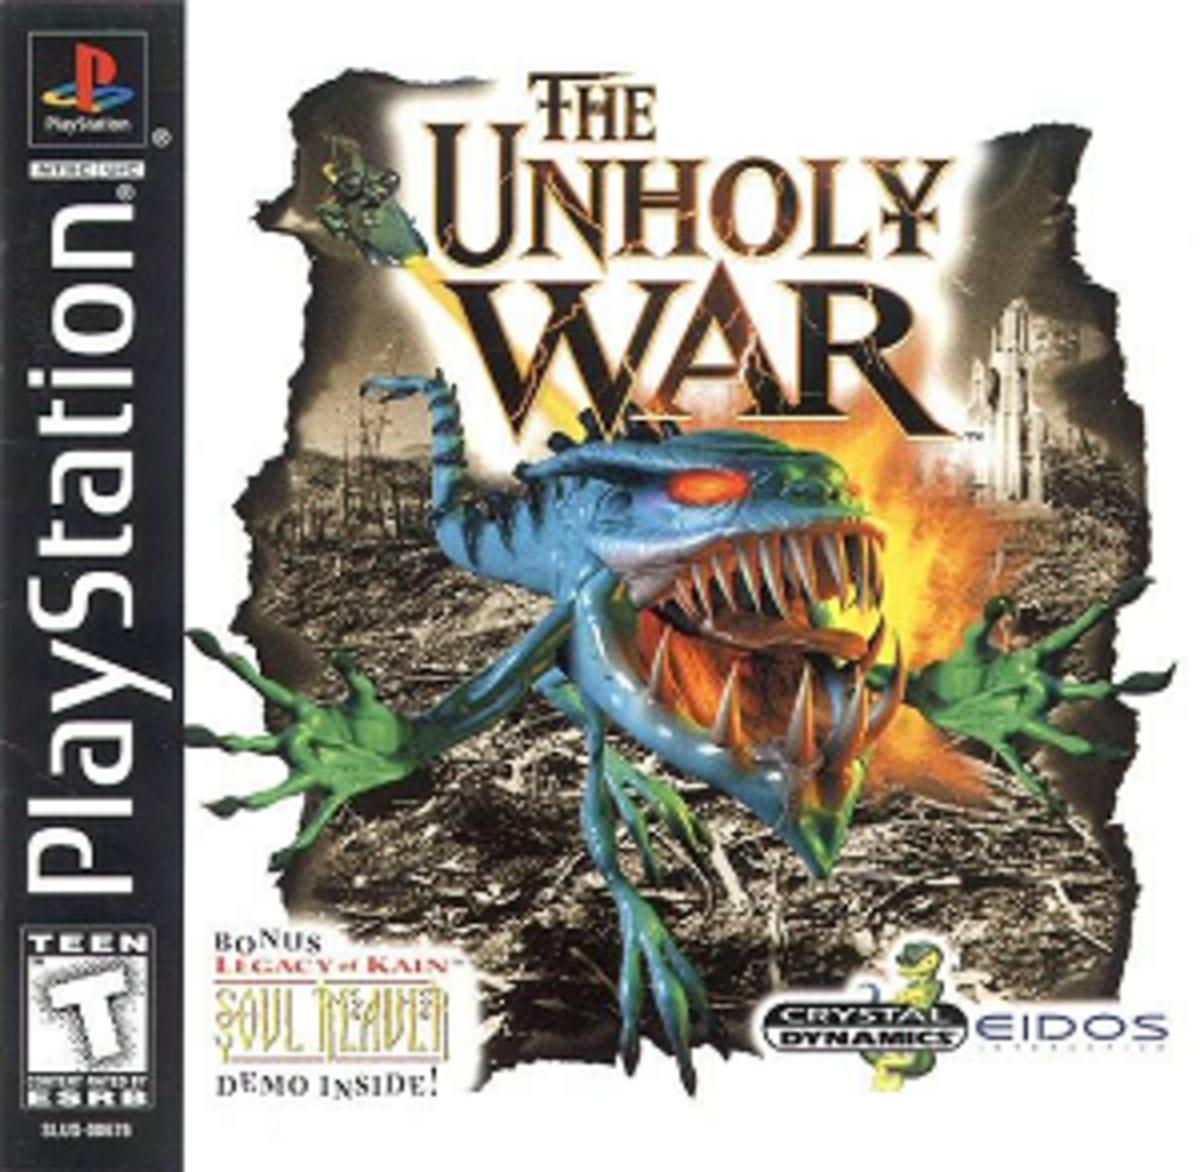 the-unholy-war-a-retrospective-review